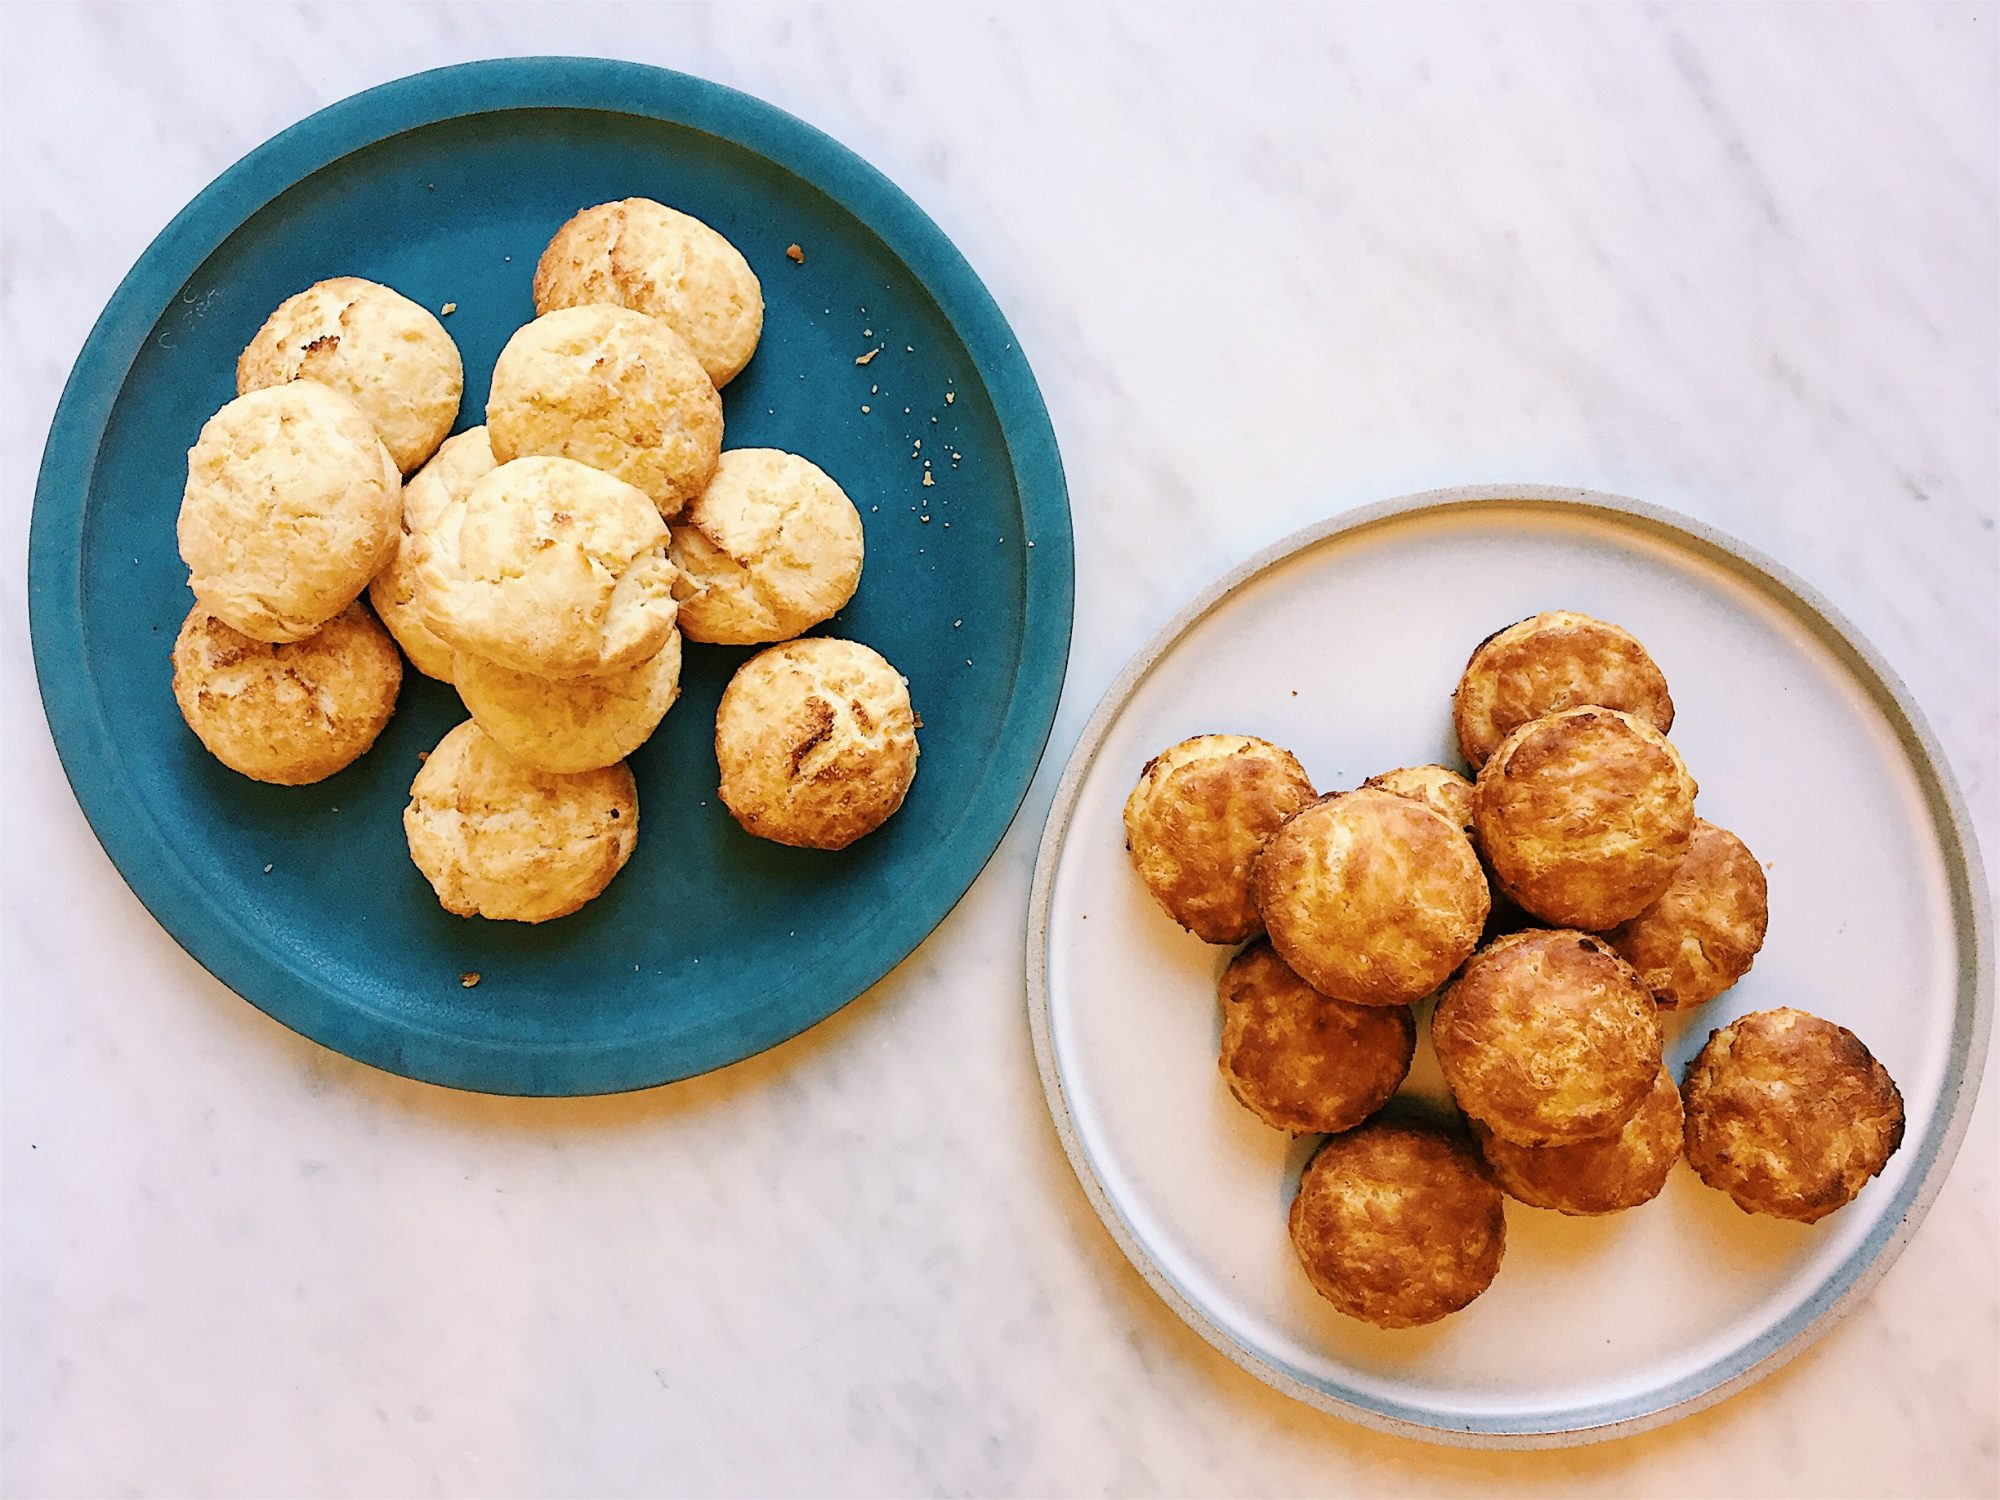 biscuits-beauty.jpg